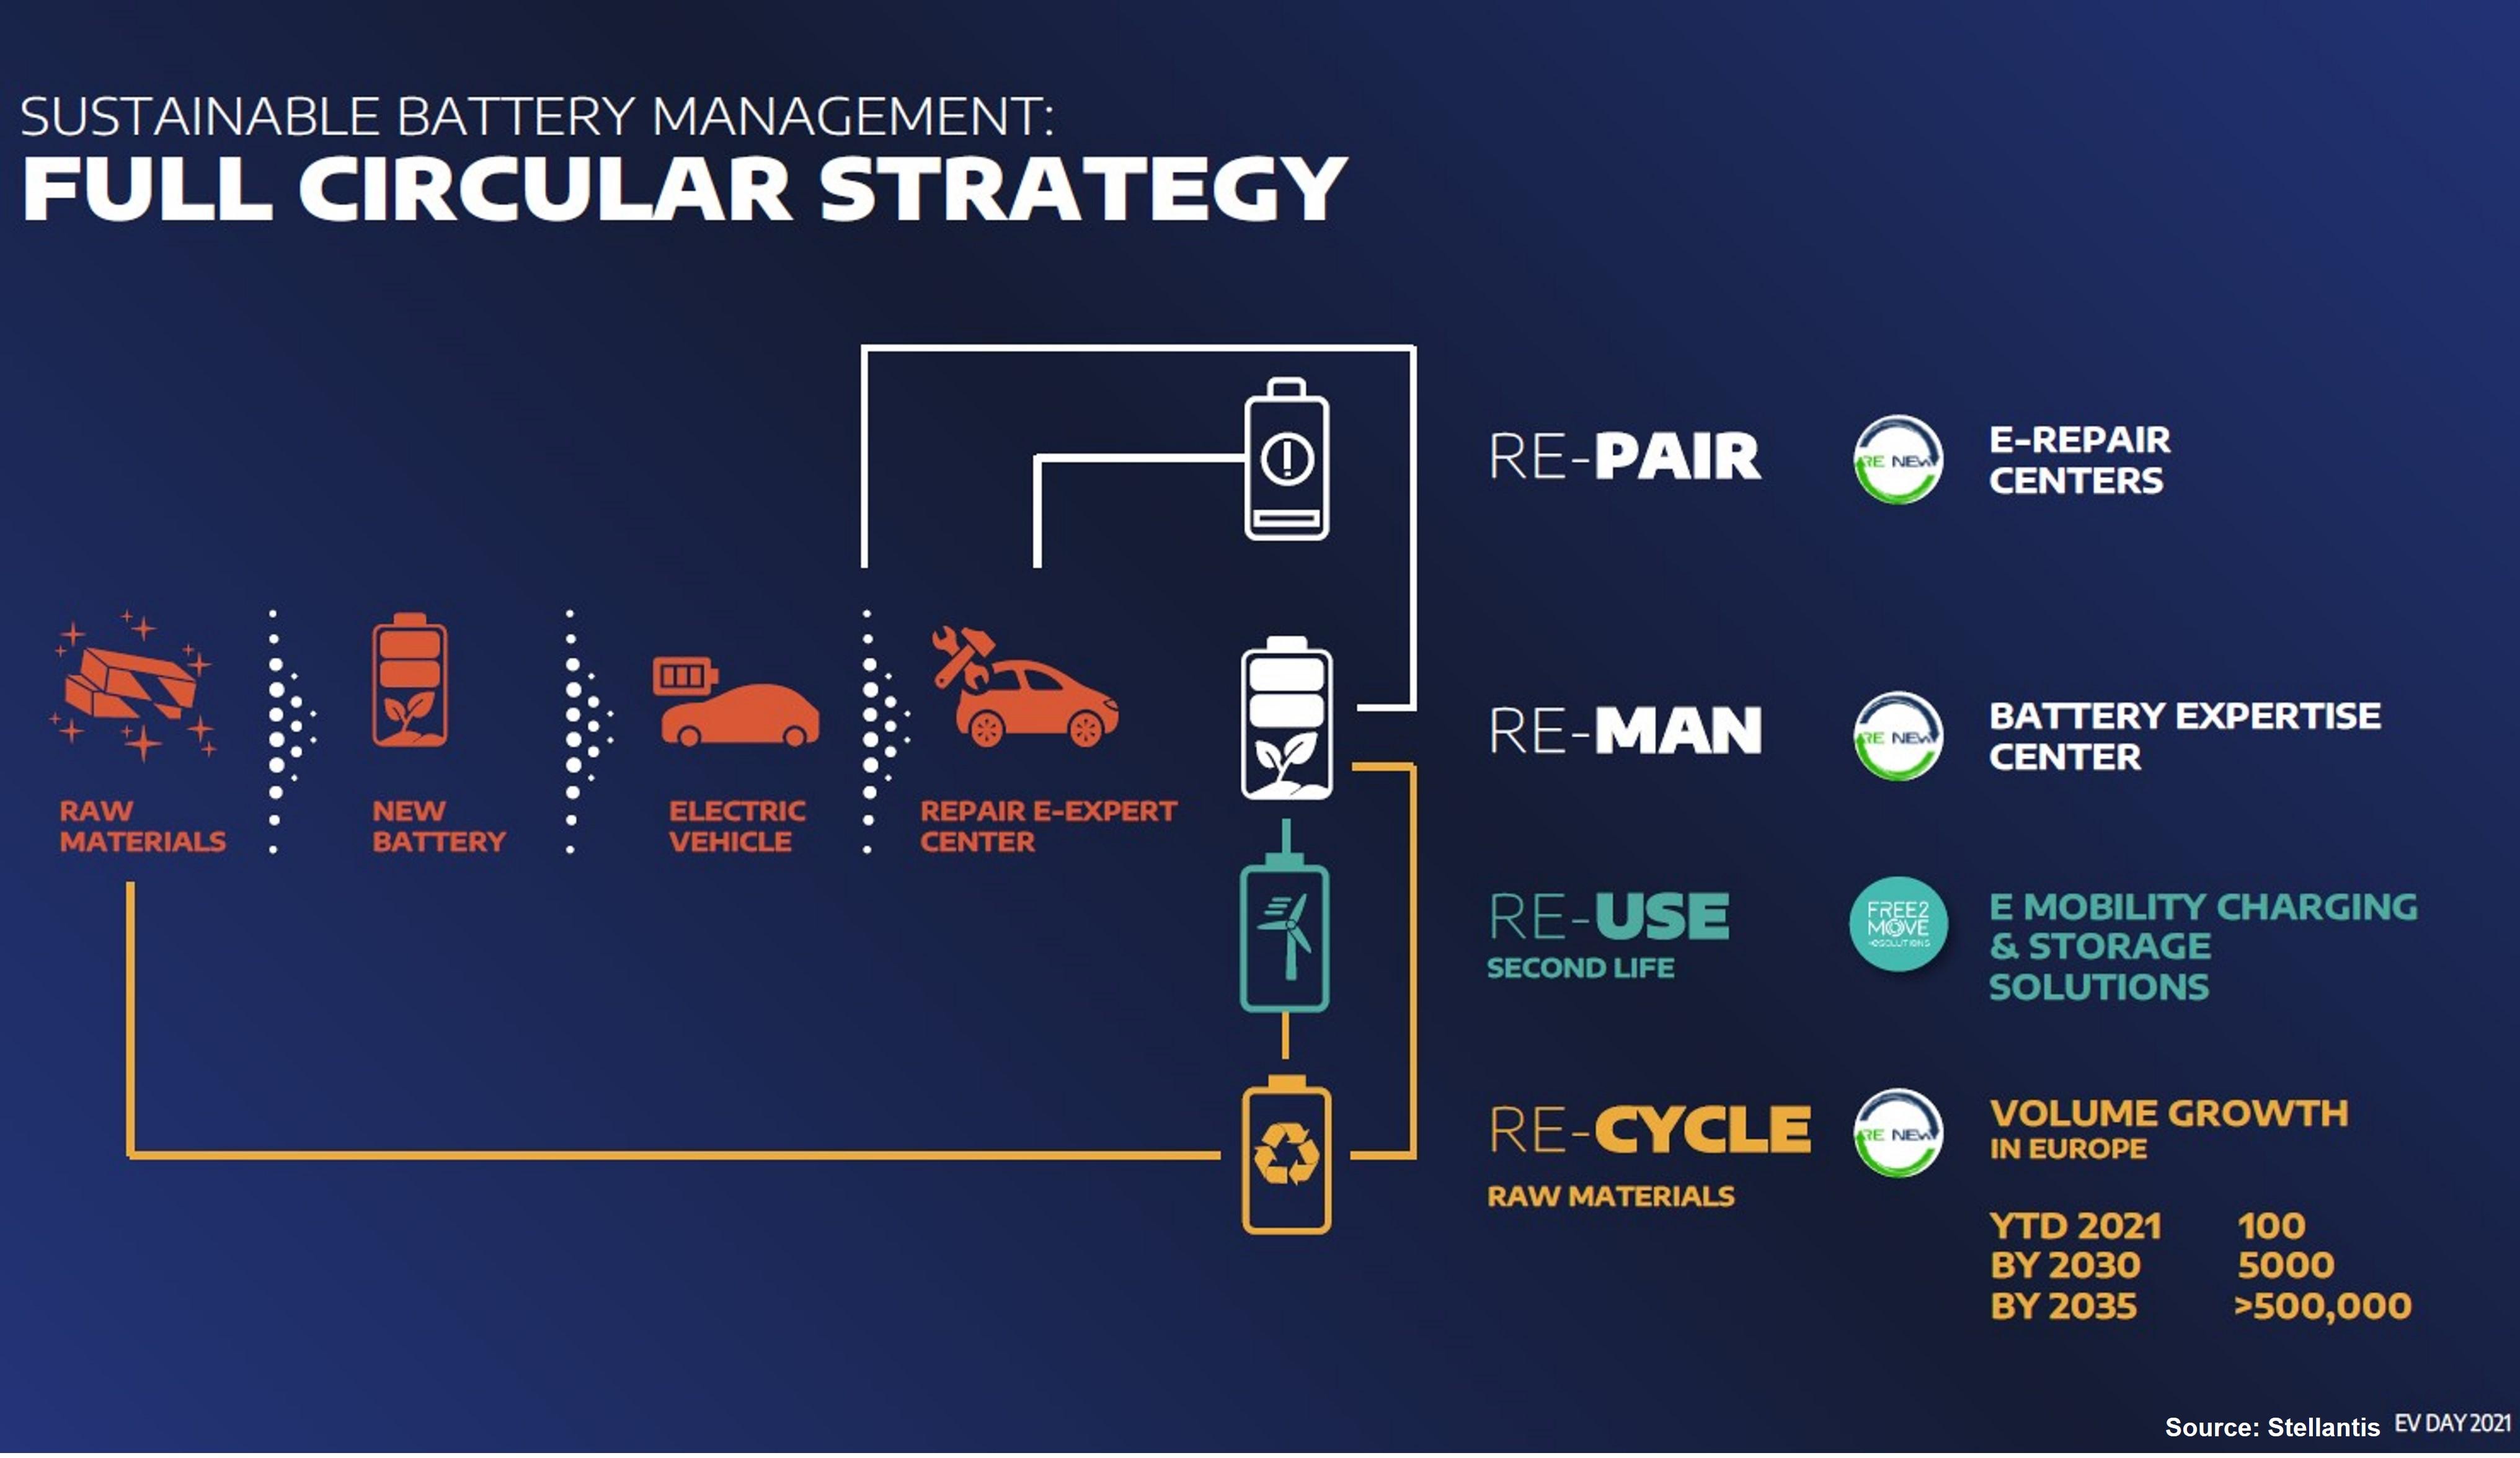 Circular Strategy